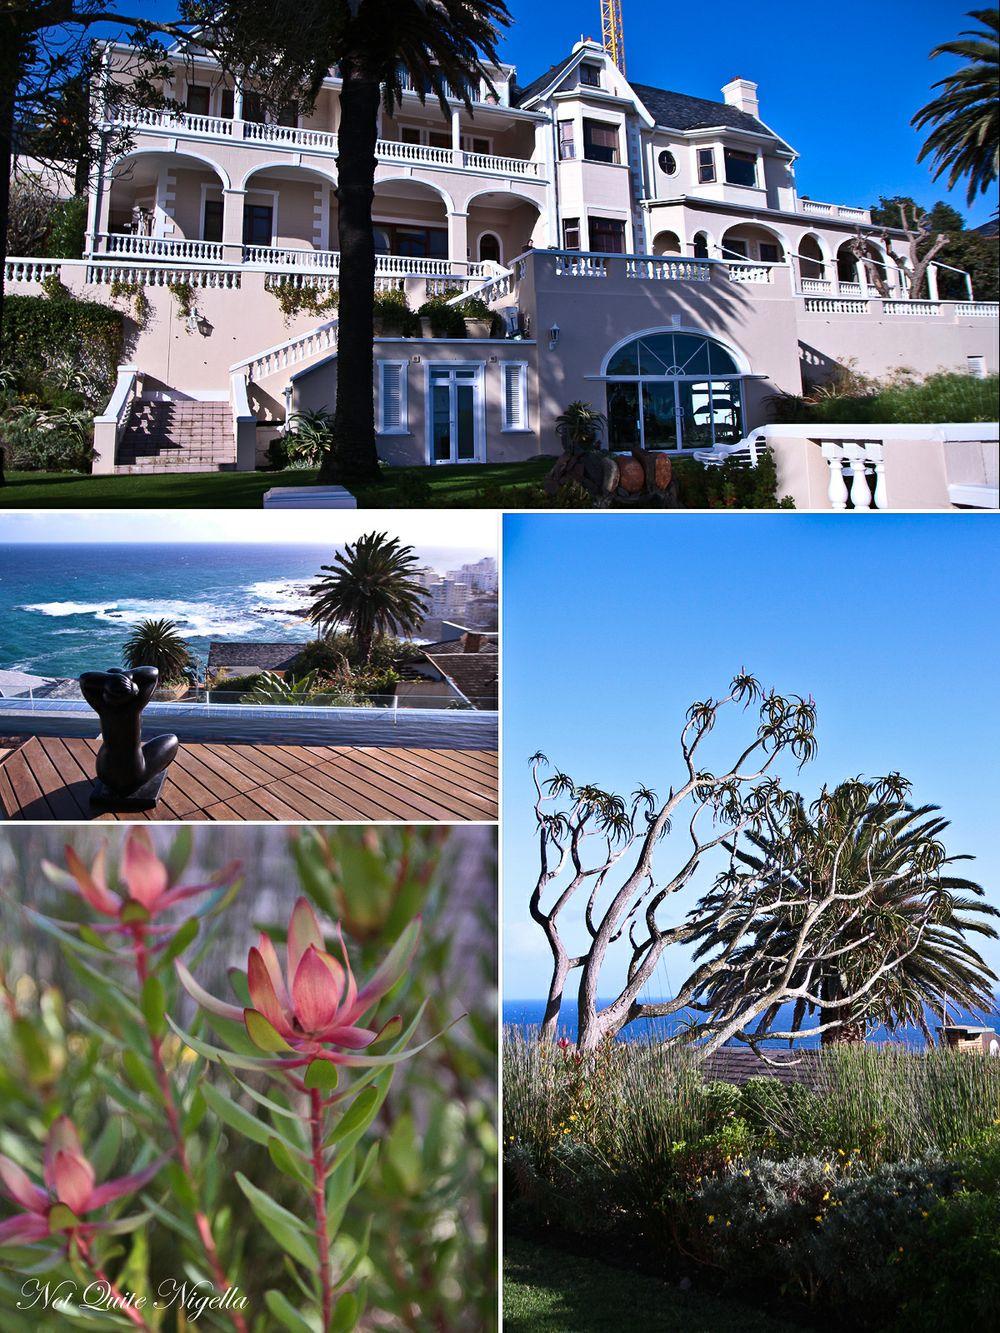 The Cape Escape: Cape Town, South Africa